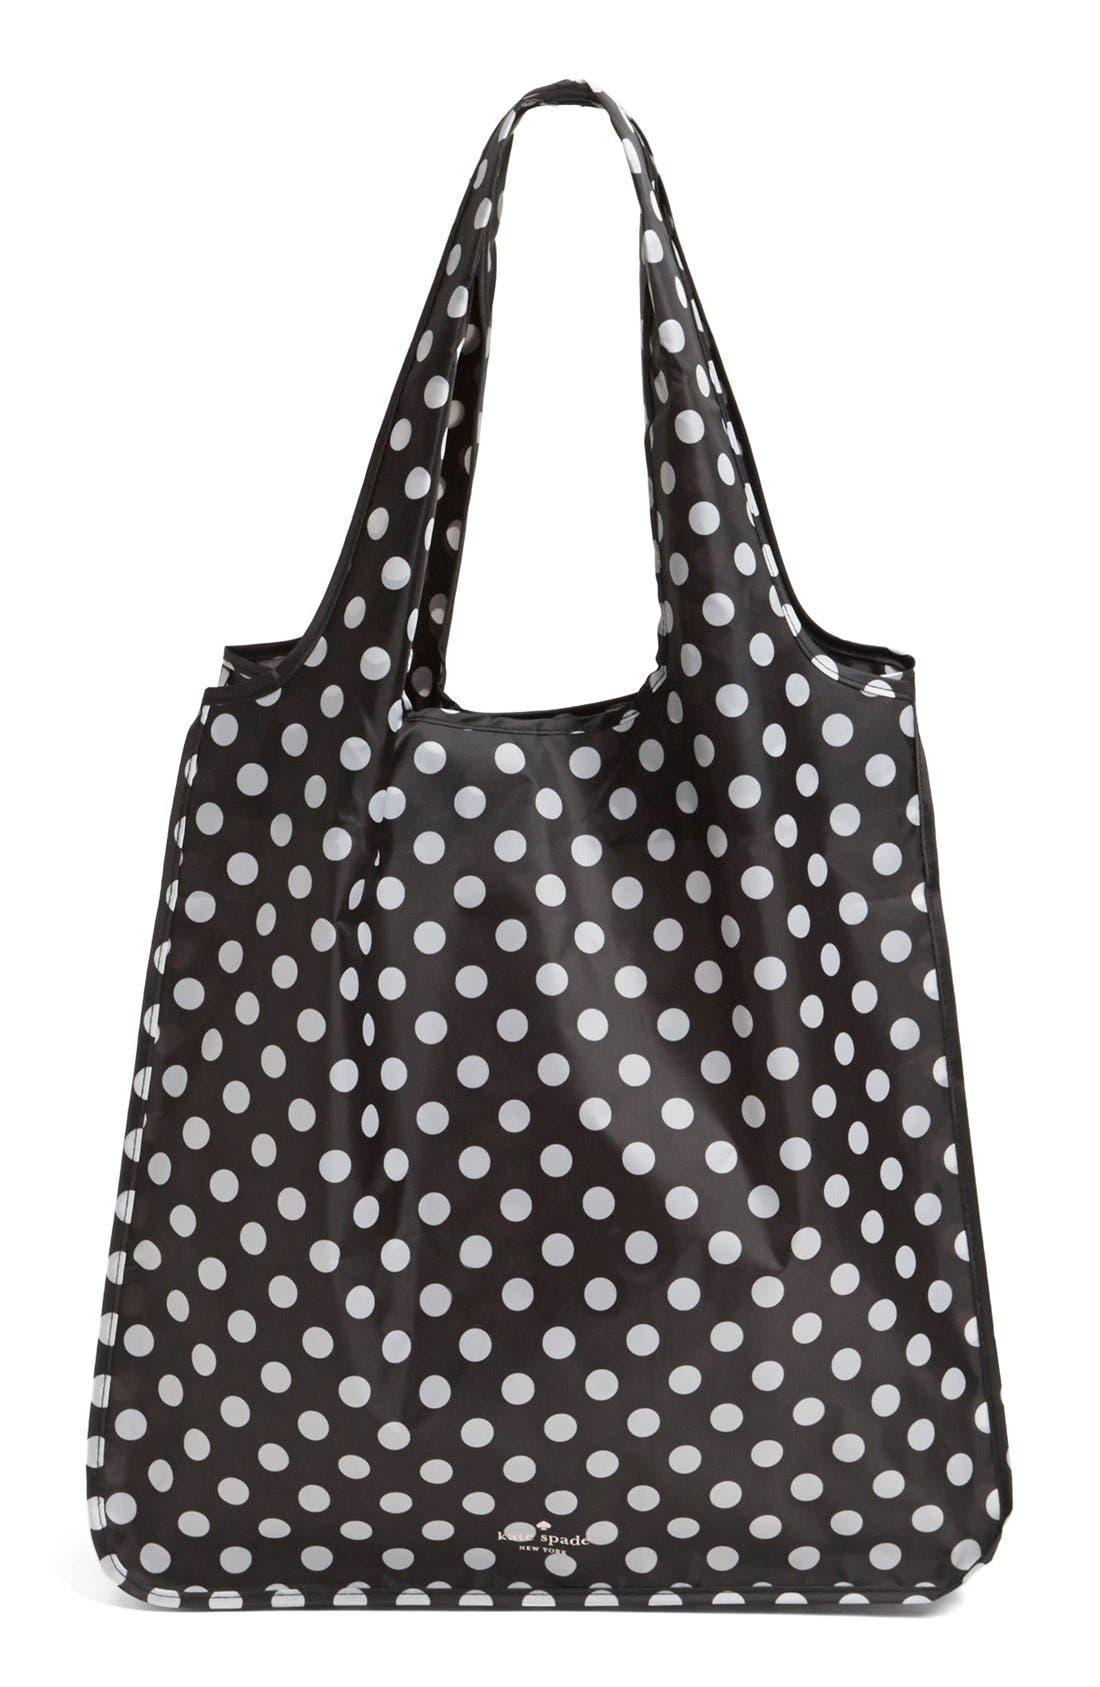 'polka dot' reusable shopping tote,                         Main,                         color, Black